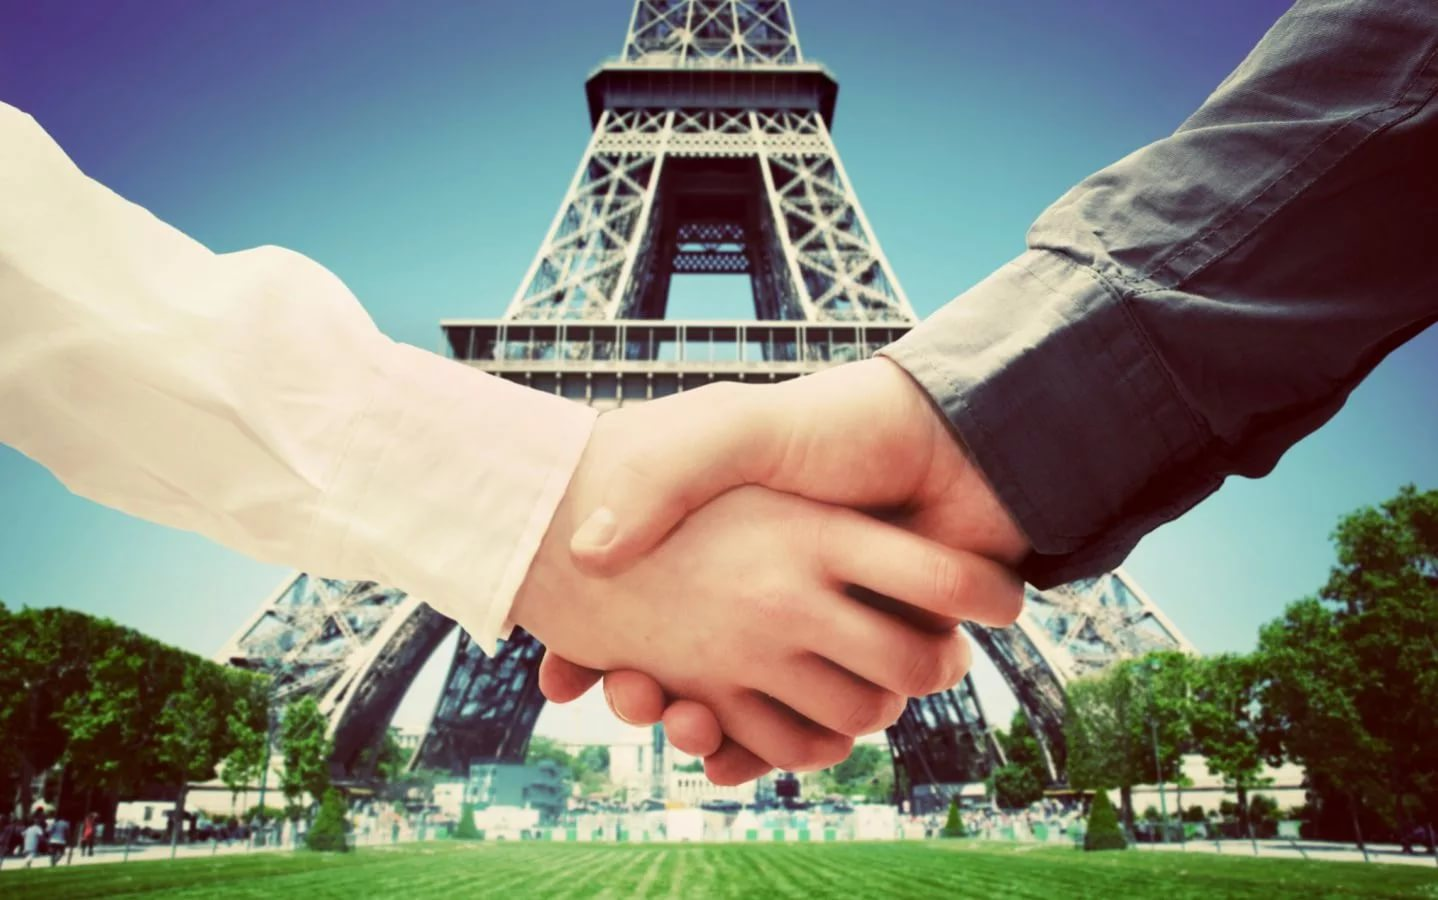 агентства по трудоустройству во франции